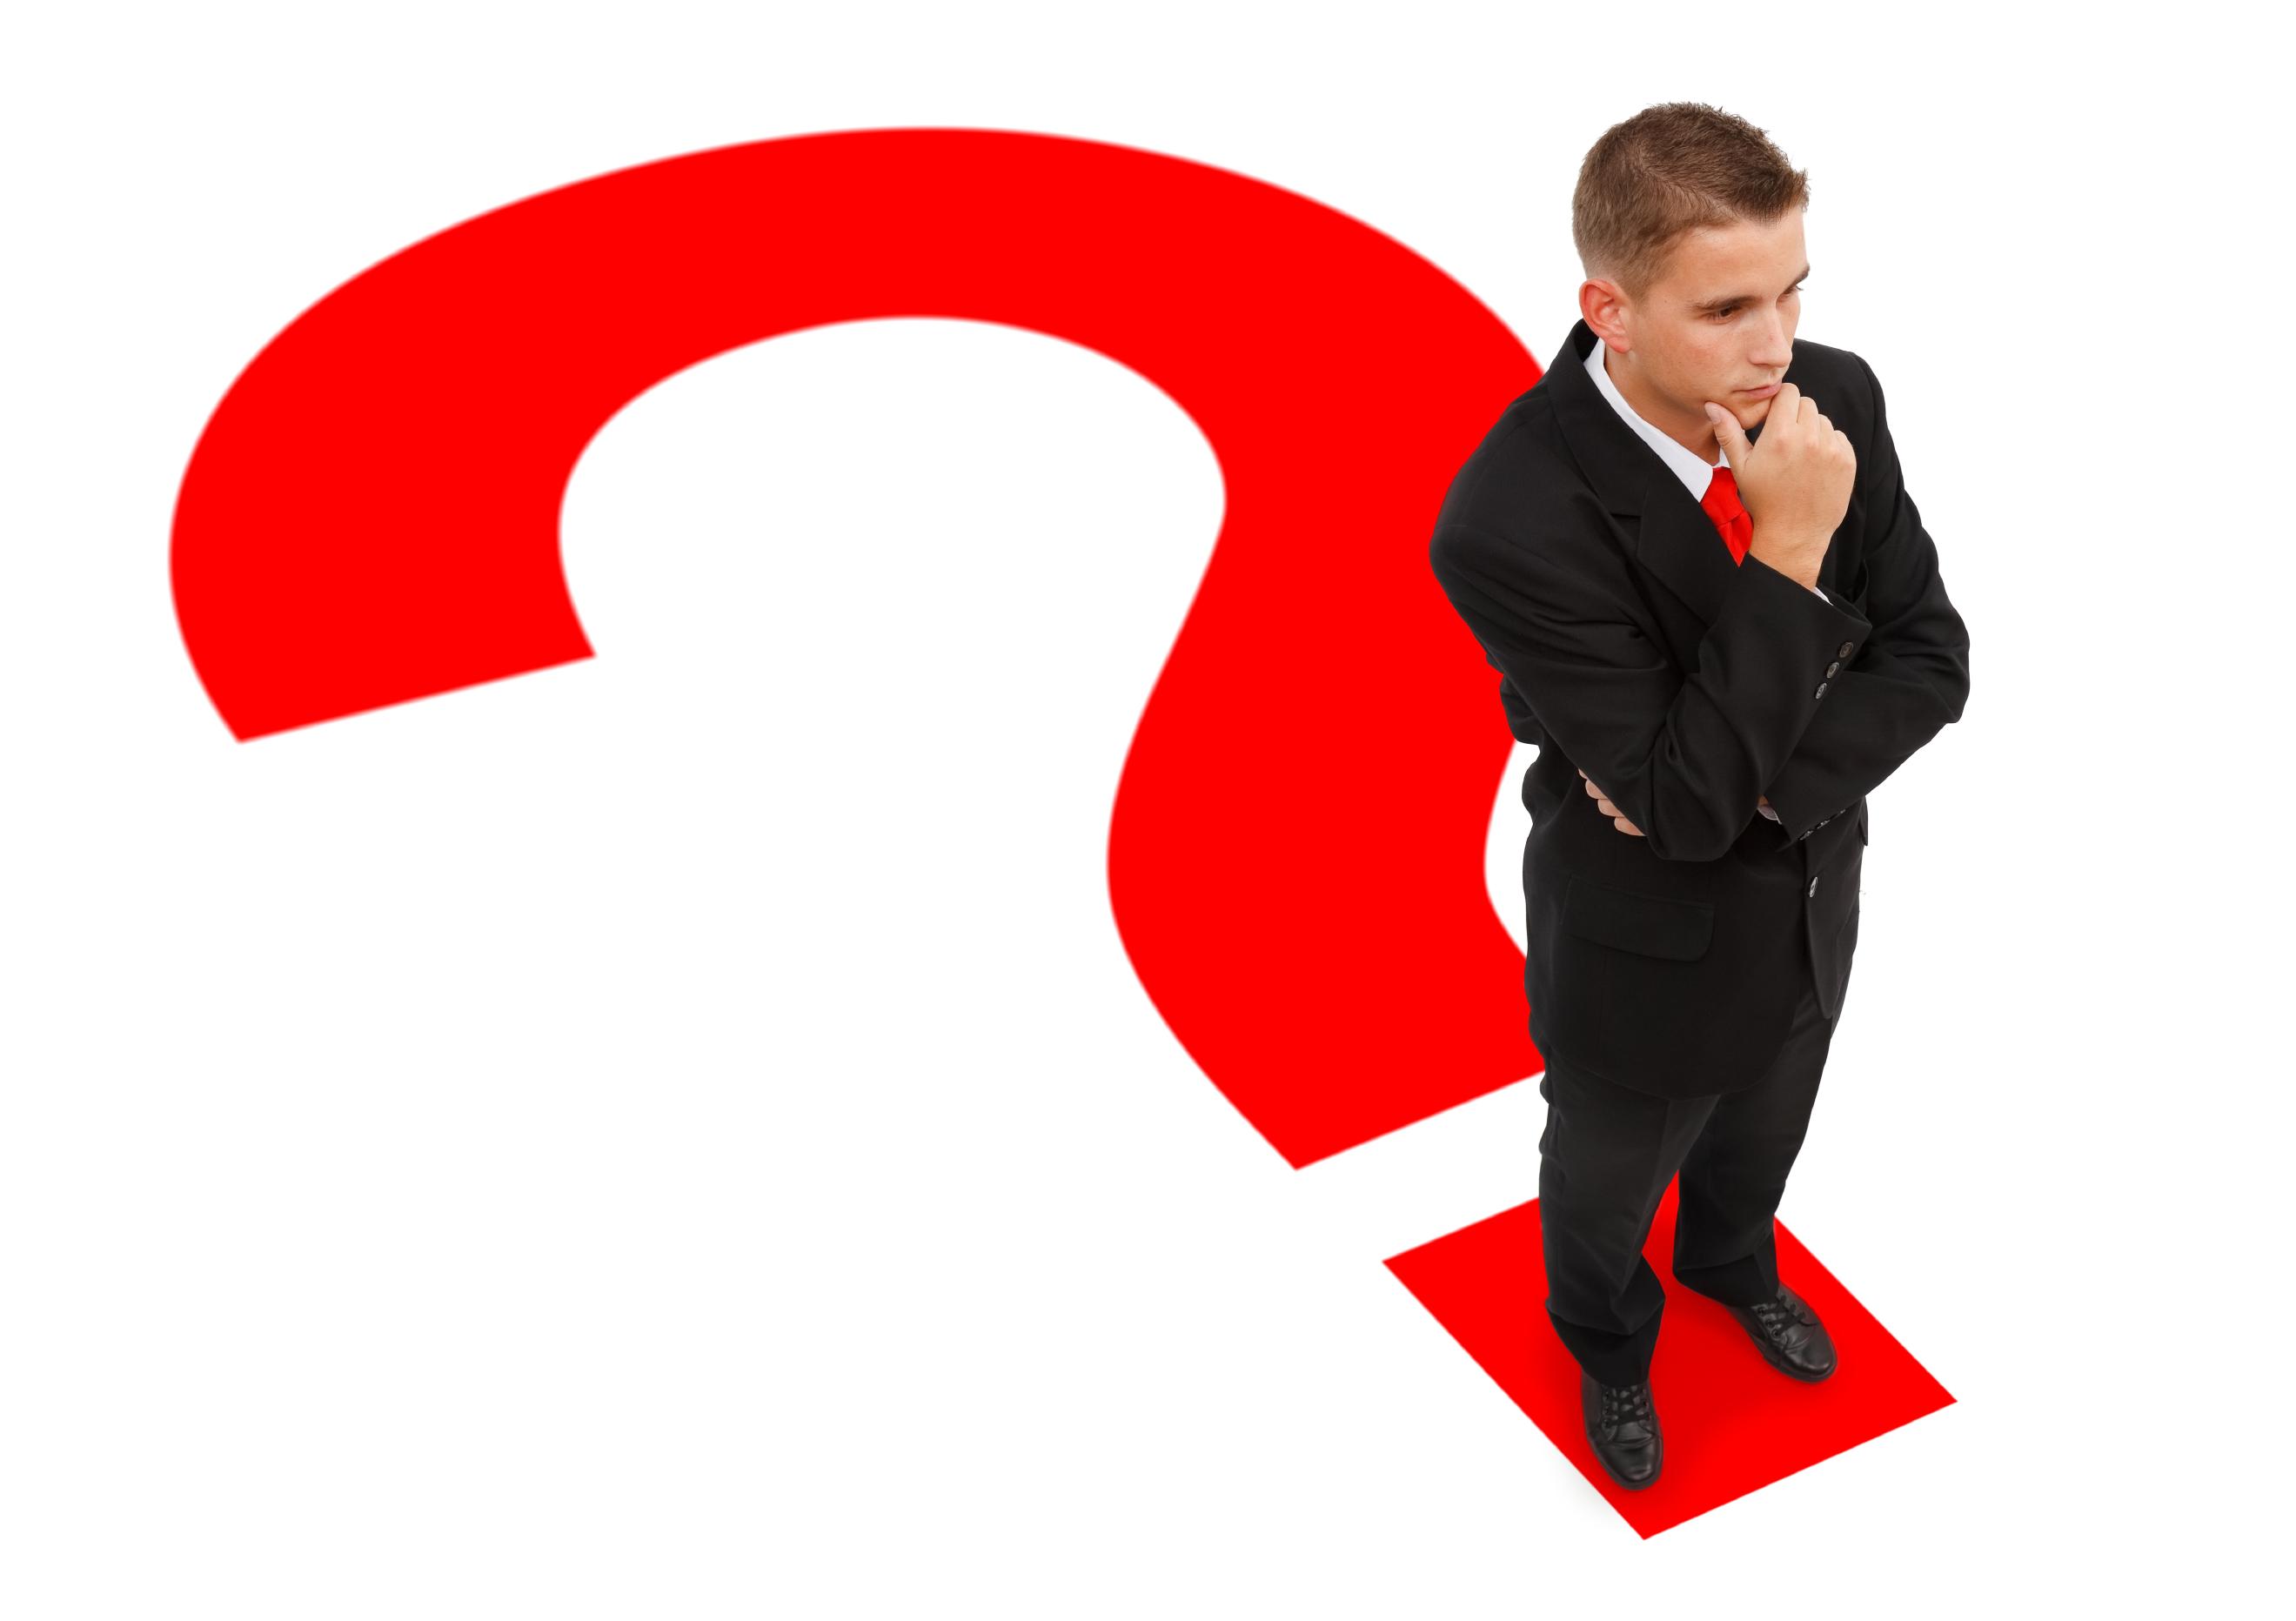 17 Soalan Kenapa Aku Belum Berjaya Dalam Bisnes